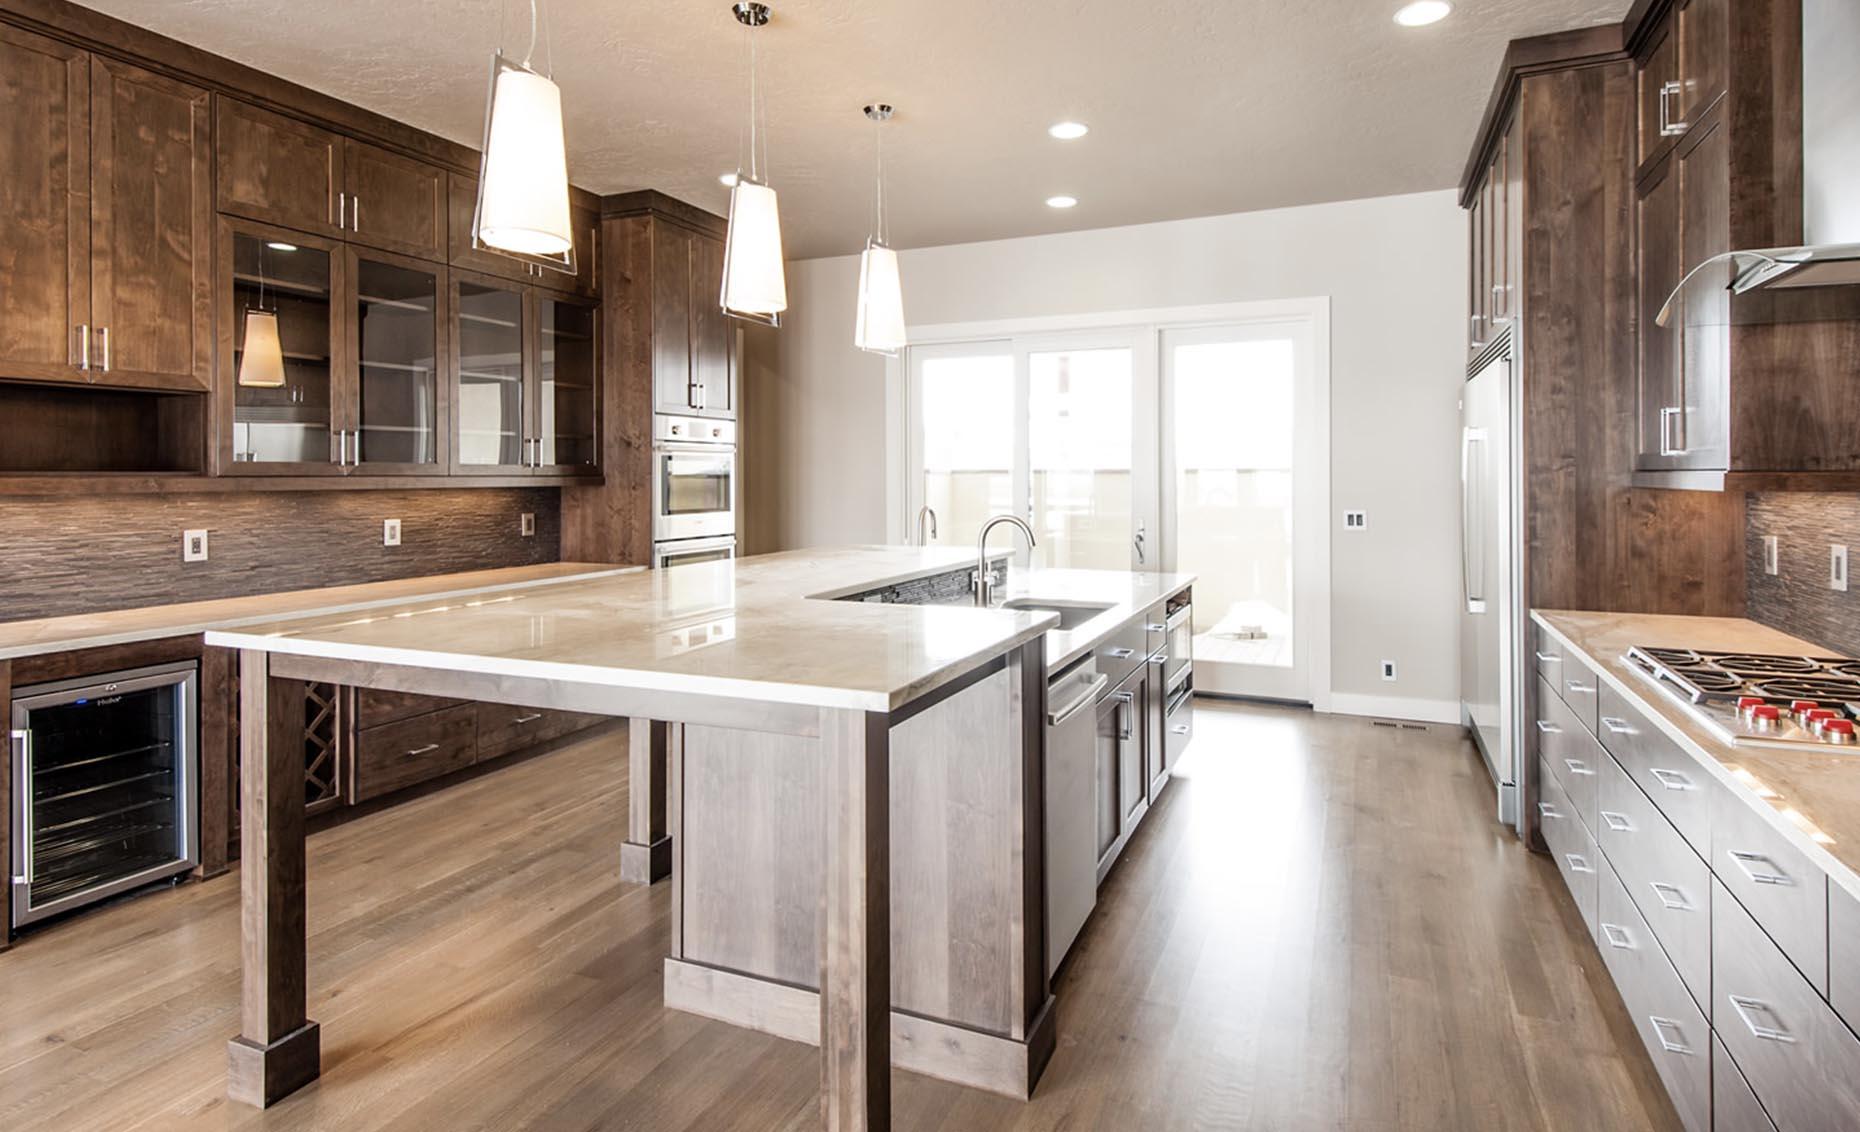 The Corrente Bello House Kitchen